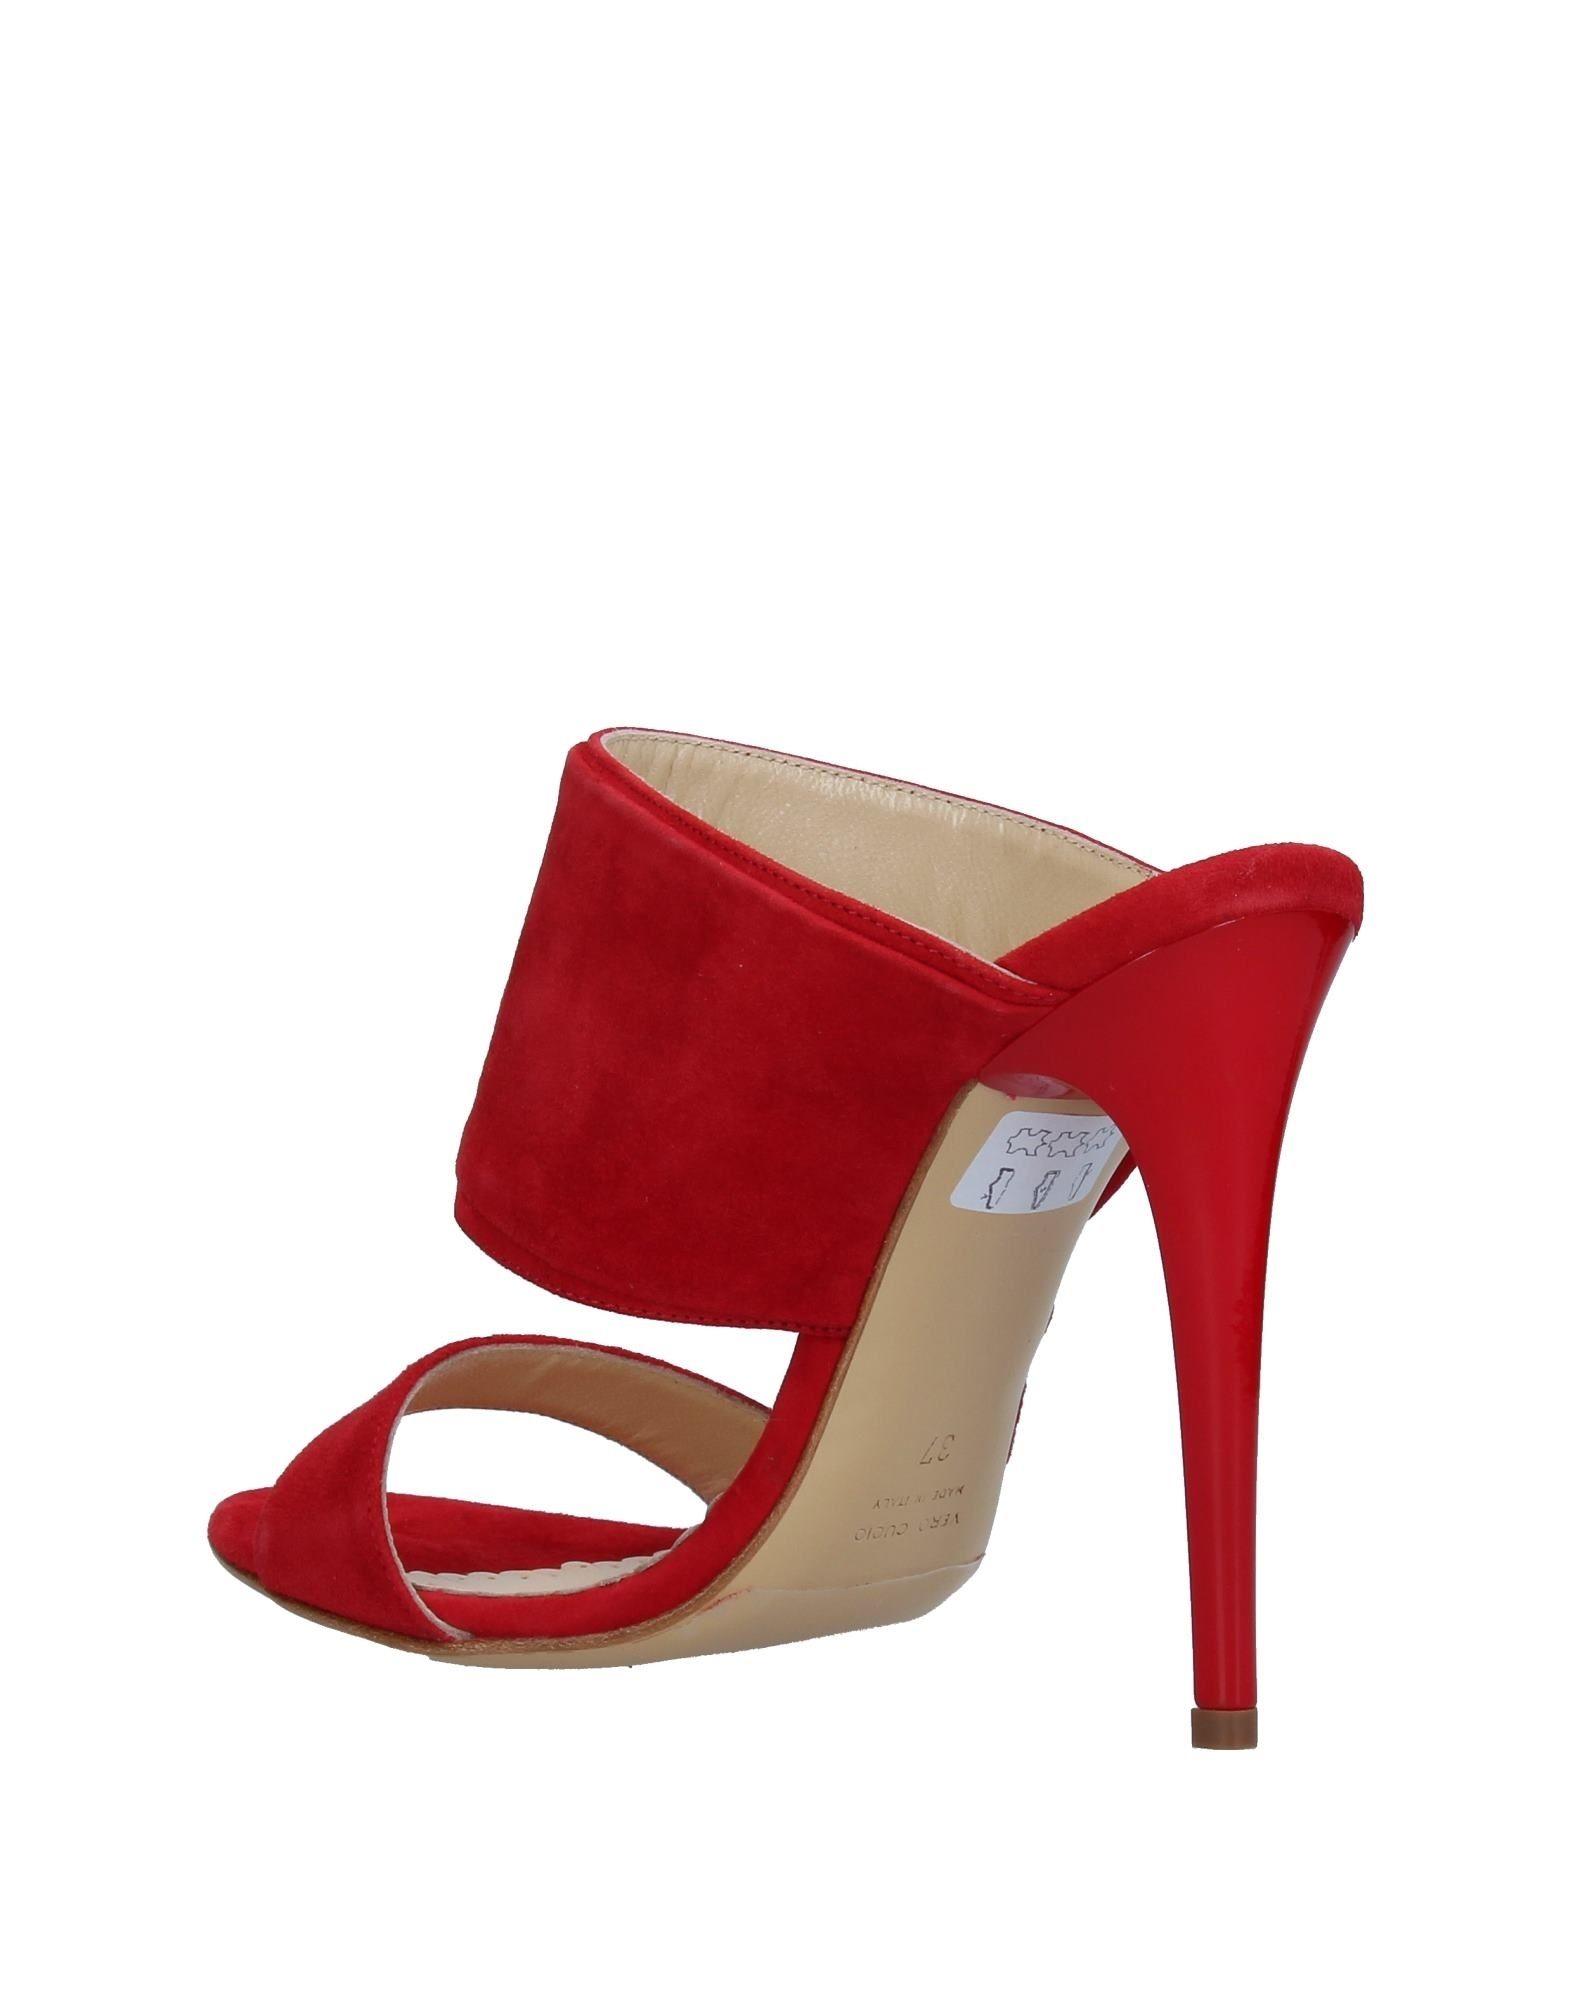 Sandales Stele Femme - Sandales Stele sur